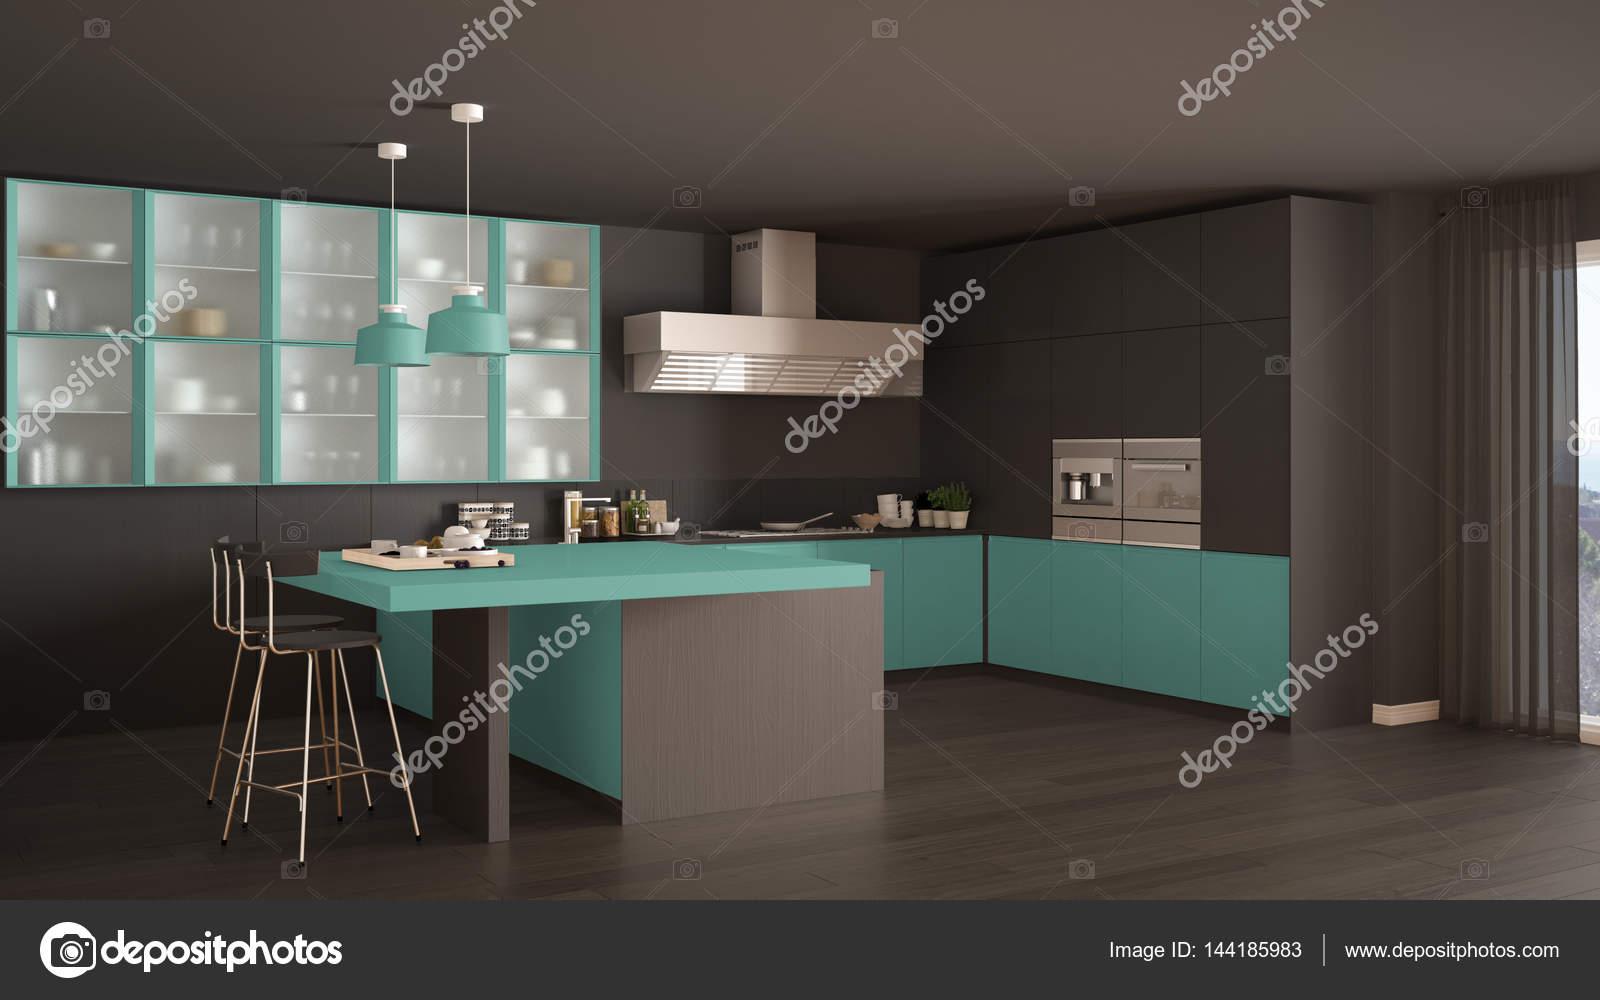 turquoise kitchen decor table and chairs ikea 经典的最小灰和绿松石厨房 镶木地板 m 图库照片 c archiviz 144185983 图库